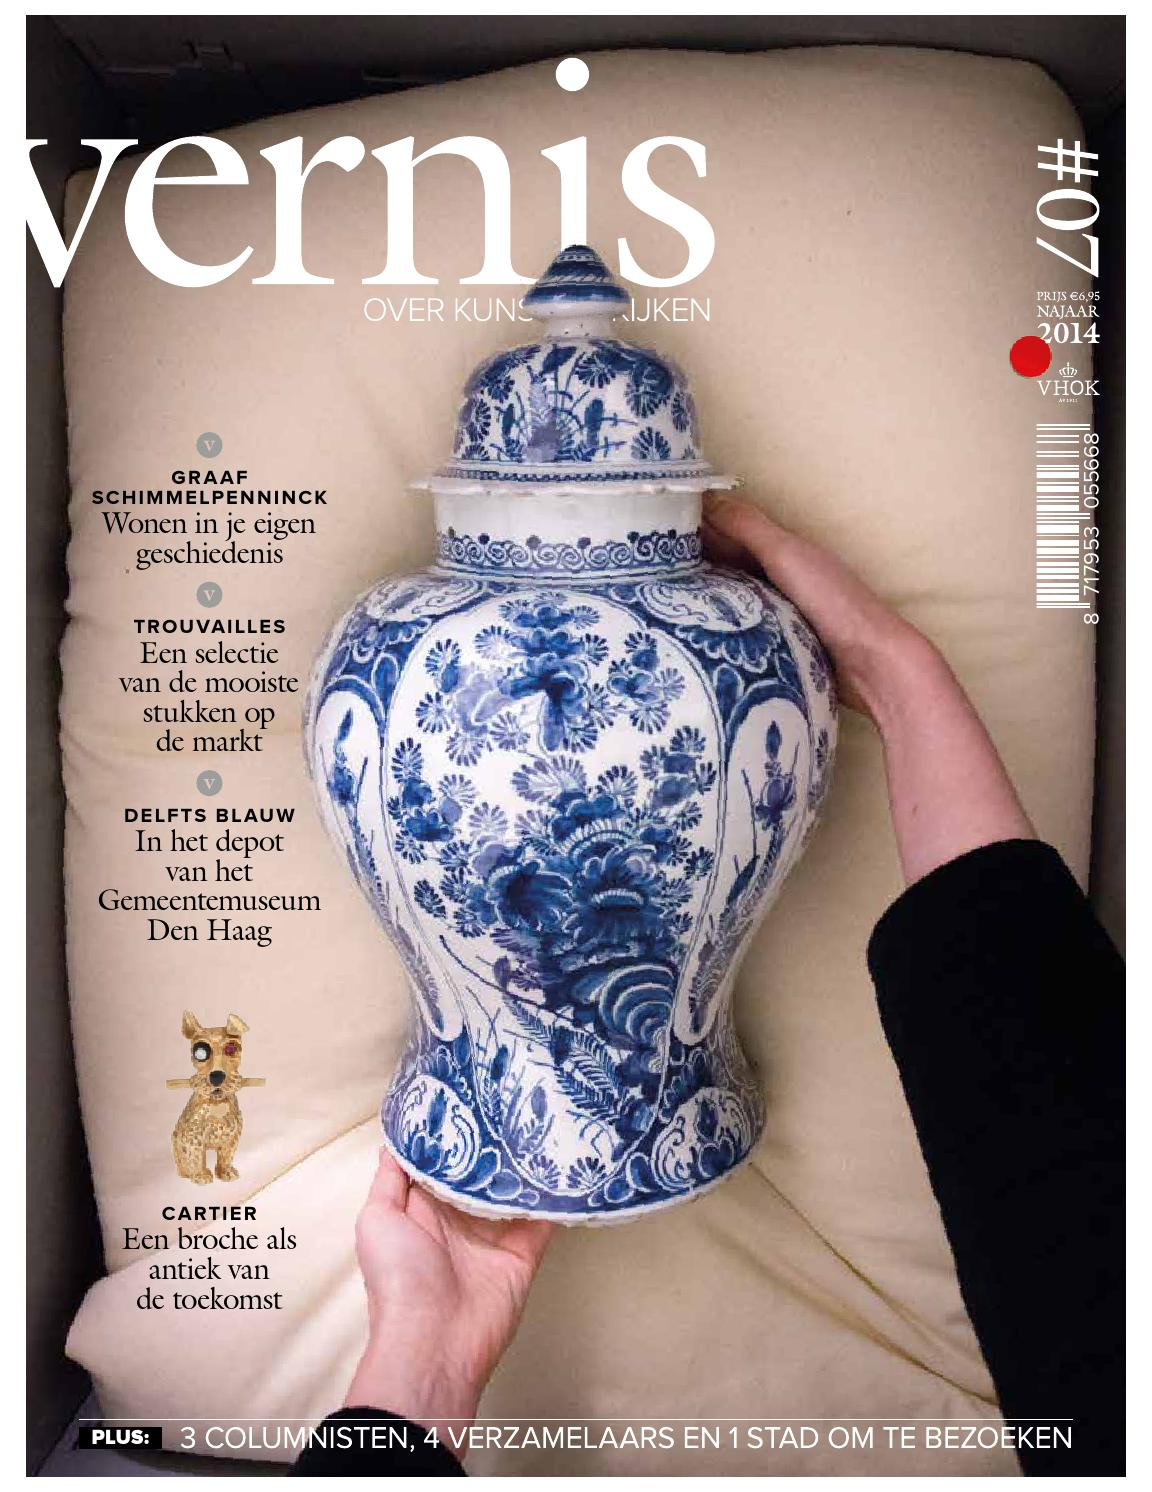 Vernis Magazine, edition#6 by Koninklijke VHOK - issuu